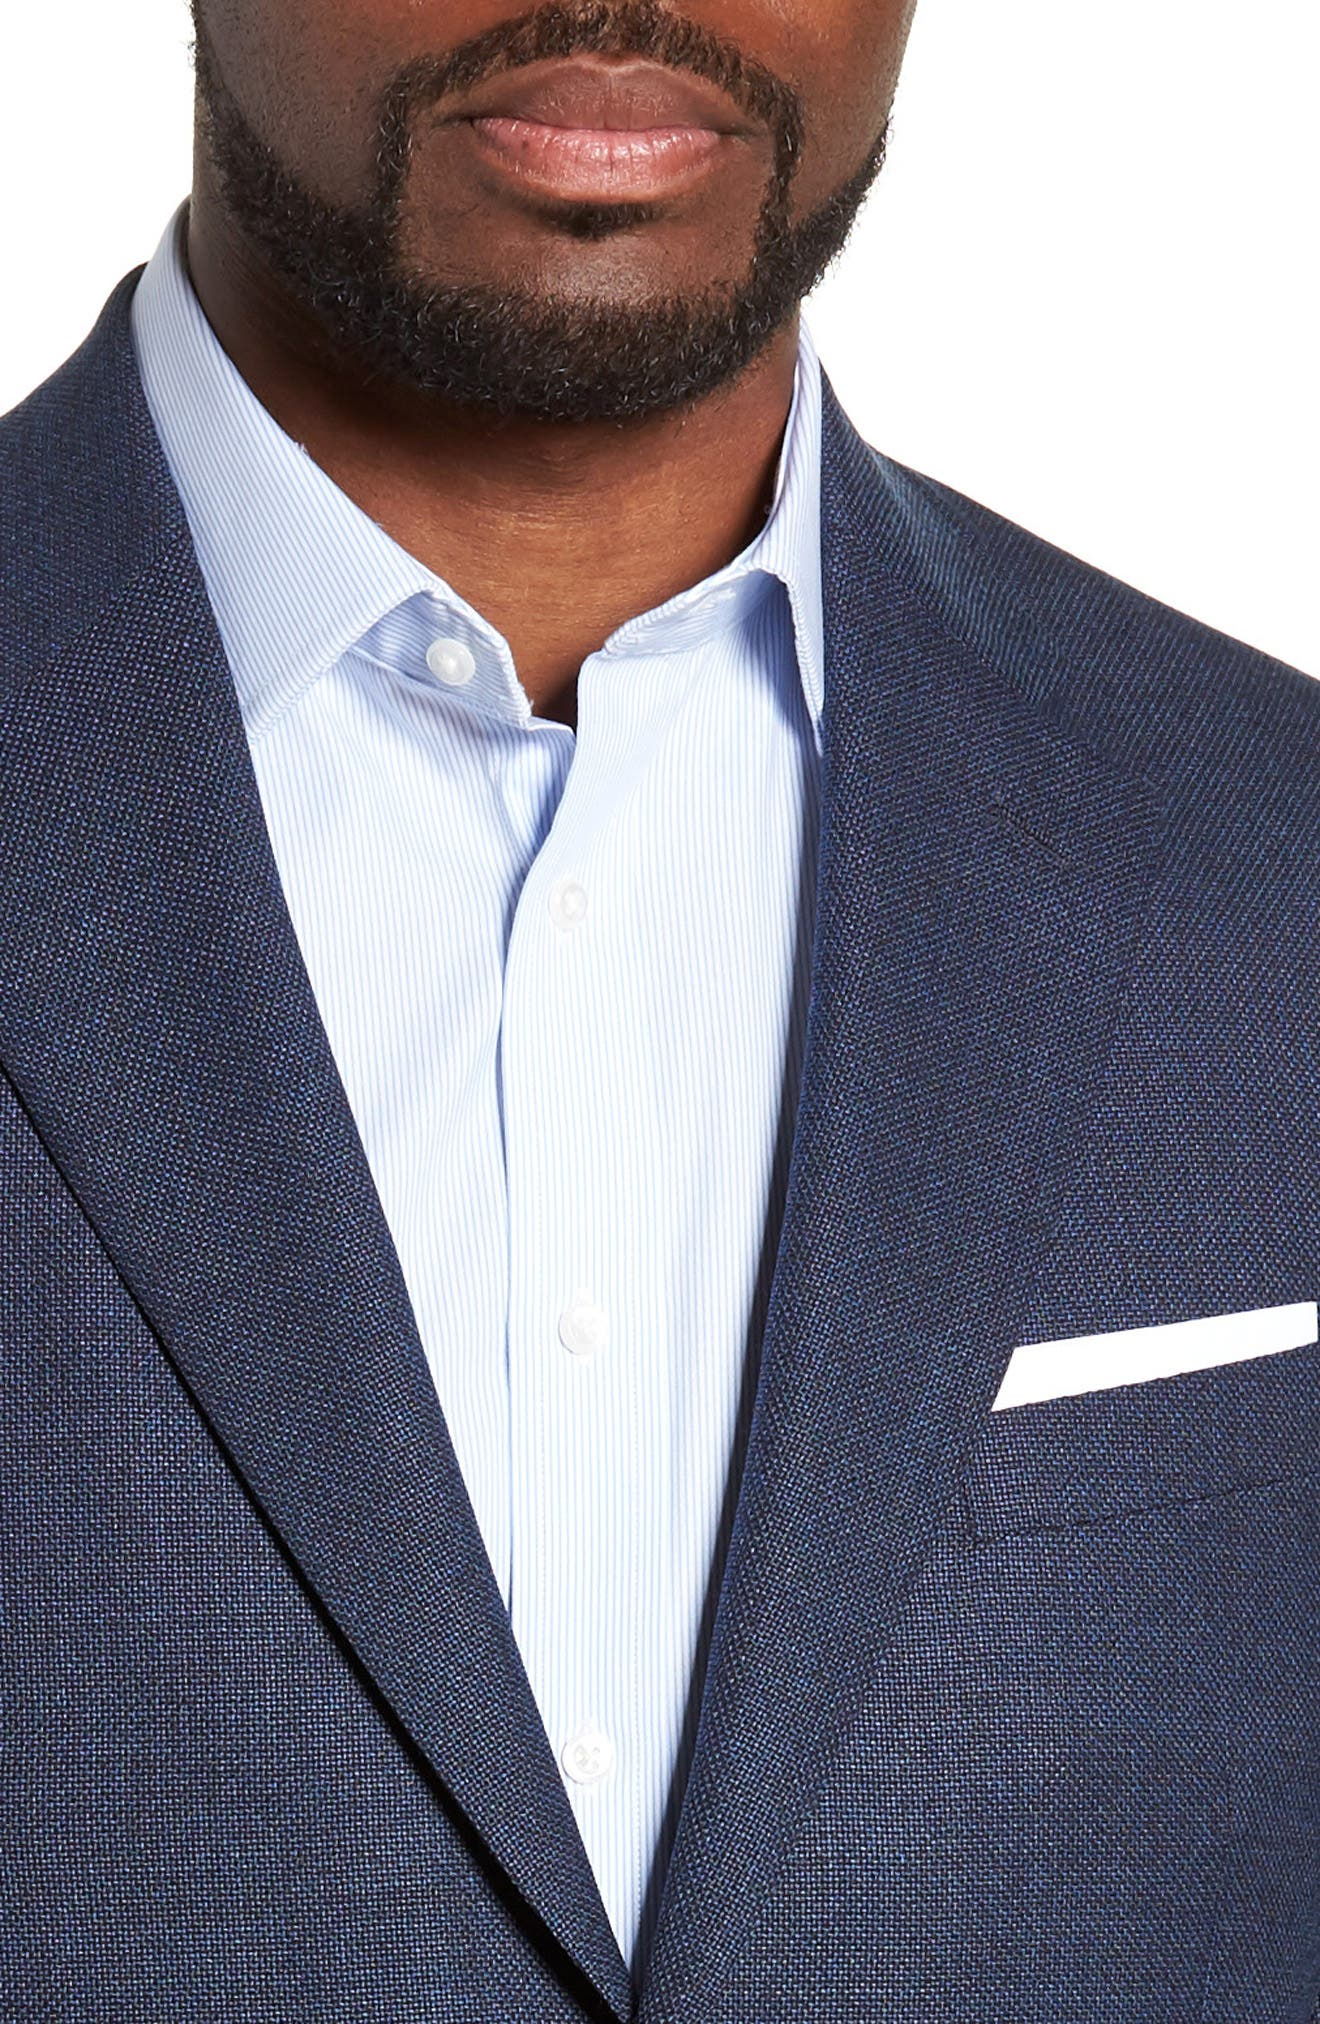 Trim Fit Crosshatched Wool Sport Coat,                             Alternate thumbnail 4, color,                             415